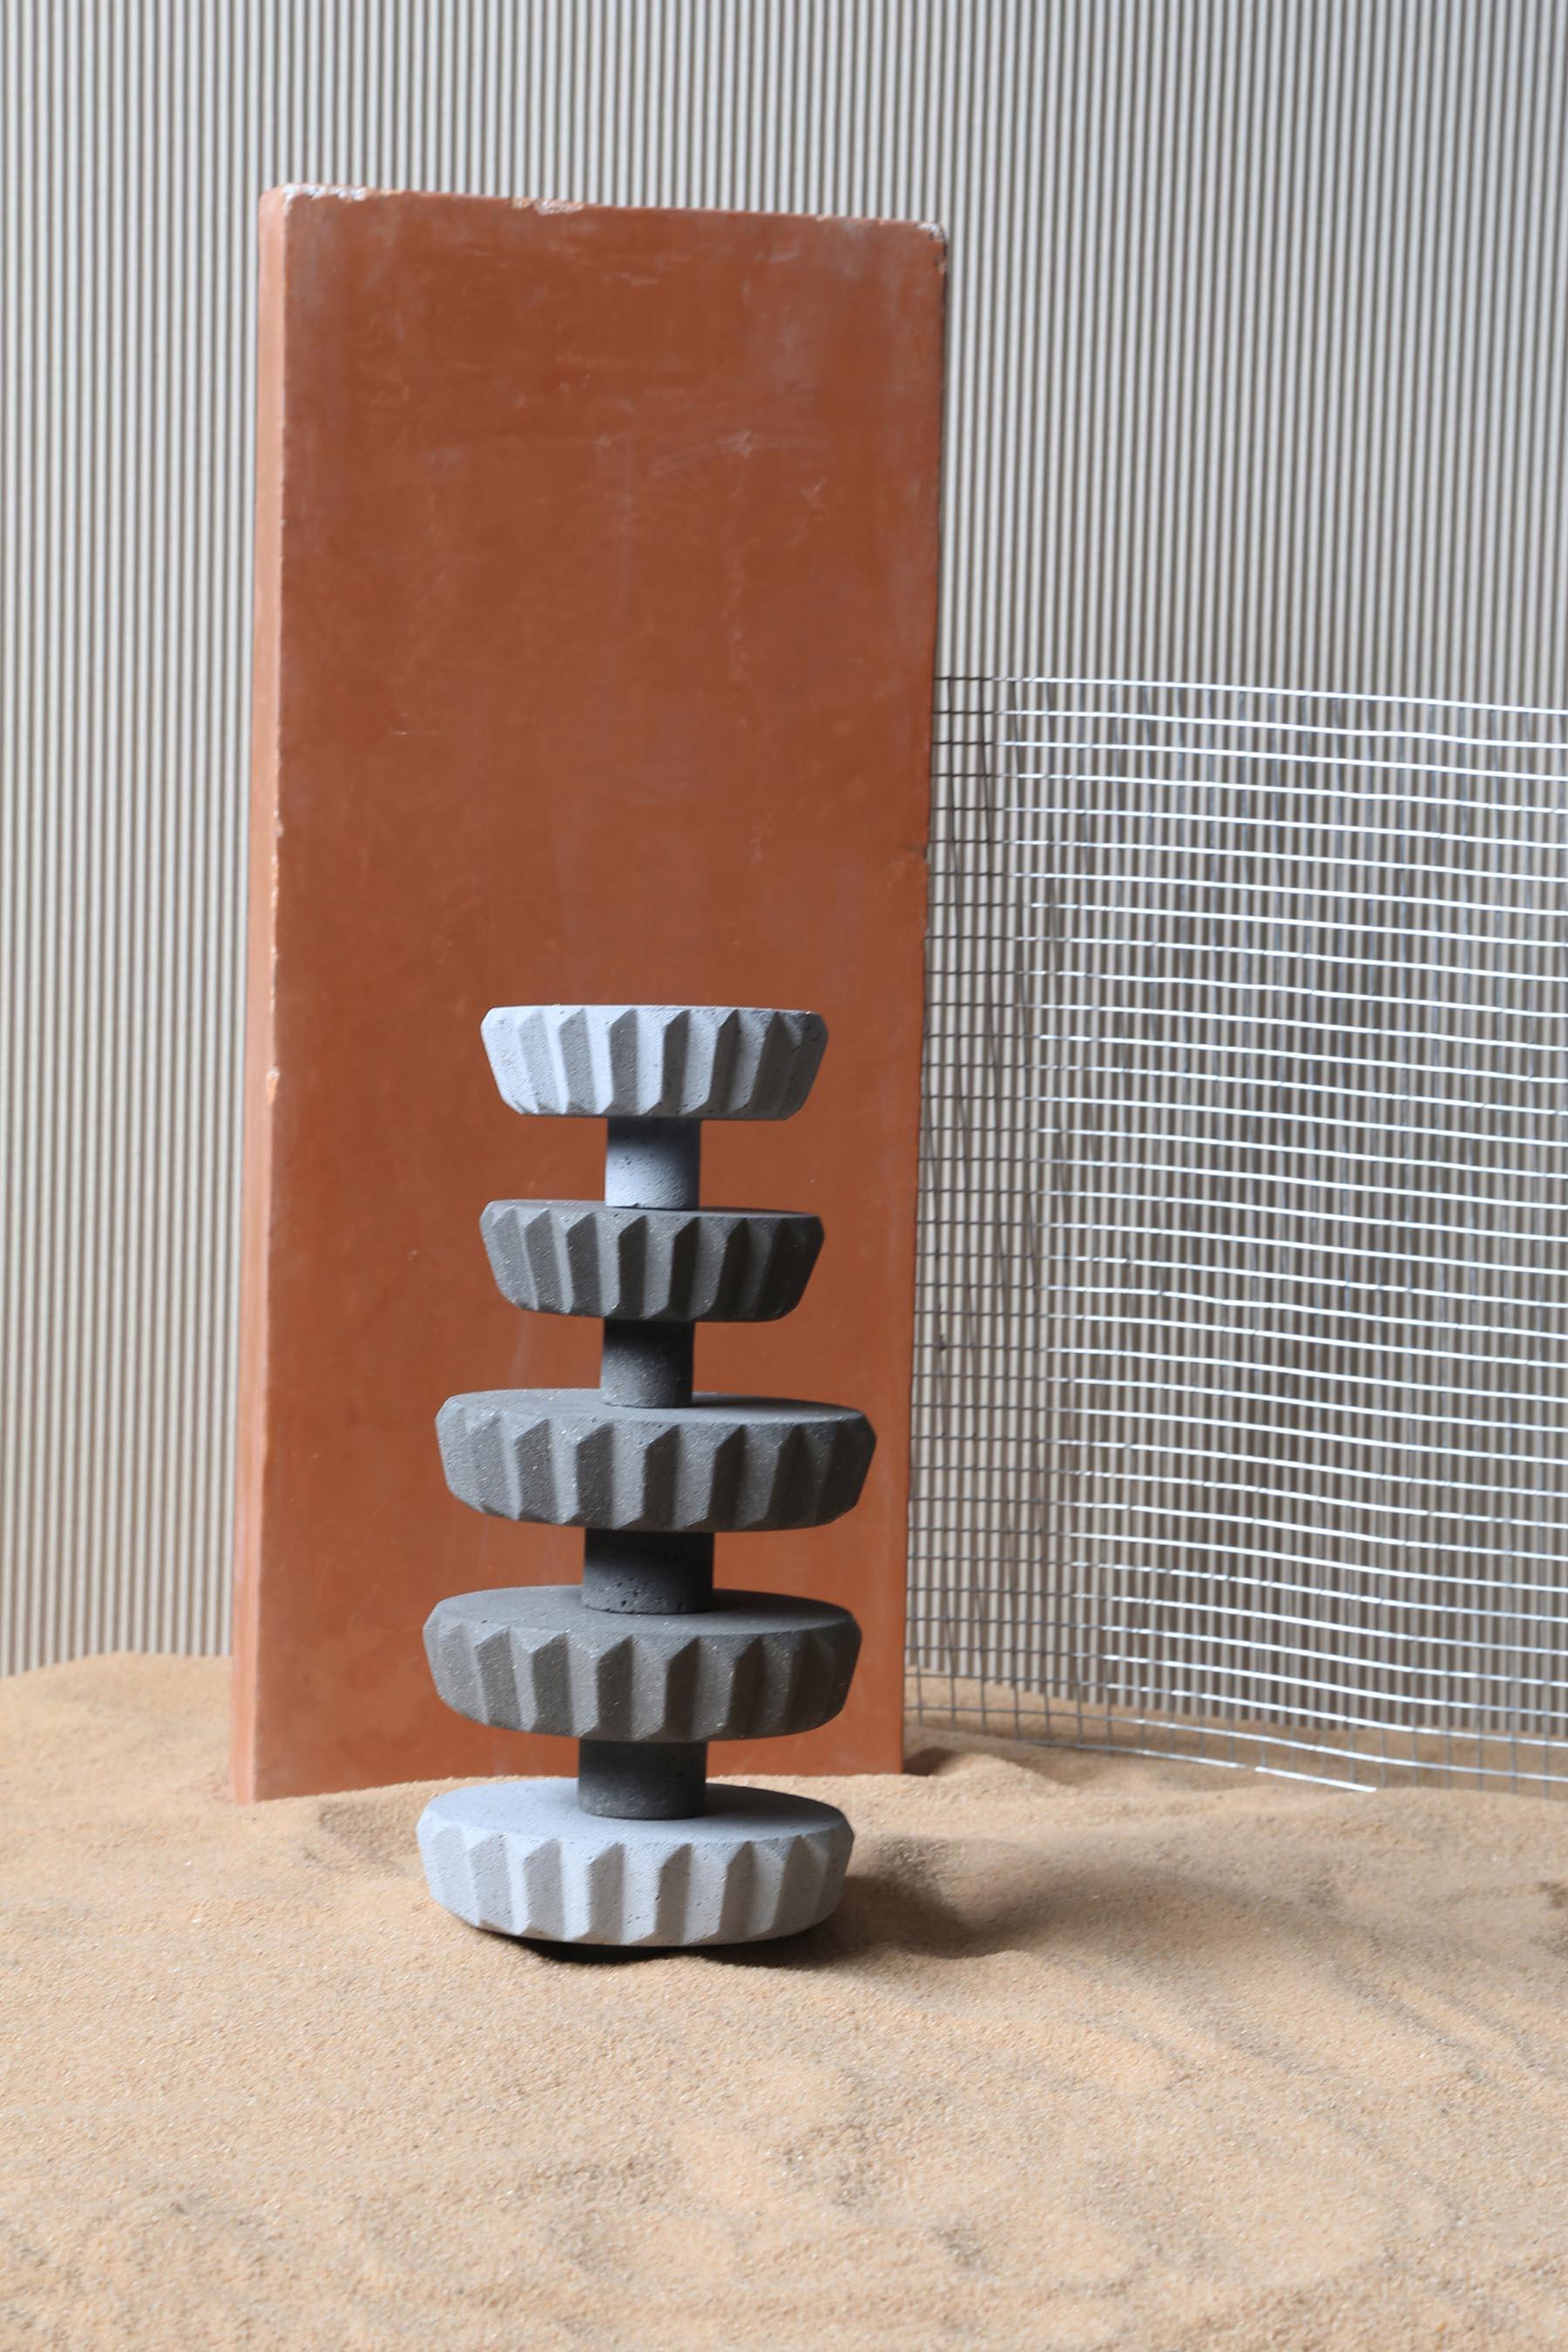 iGNANT-Design-Gian-Paulo-Venier-Siman-06